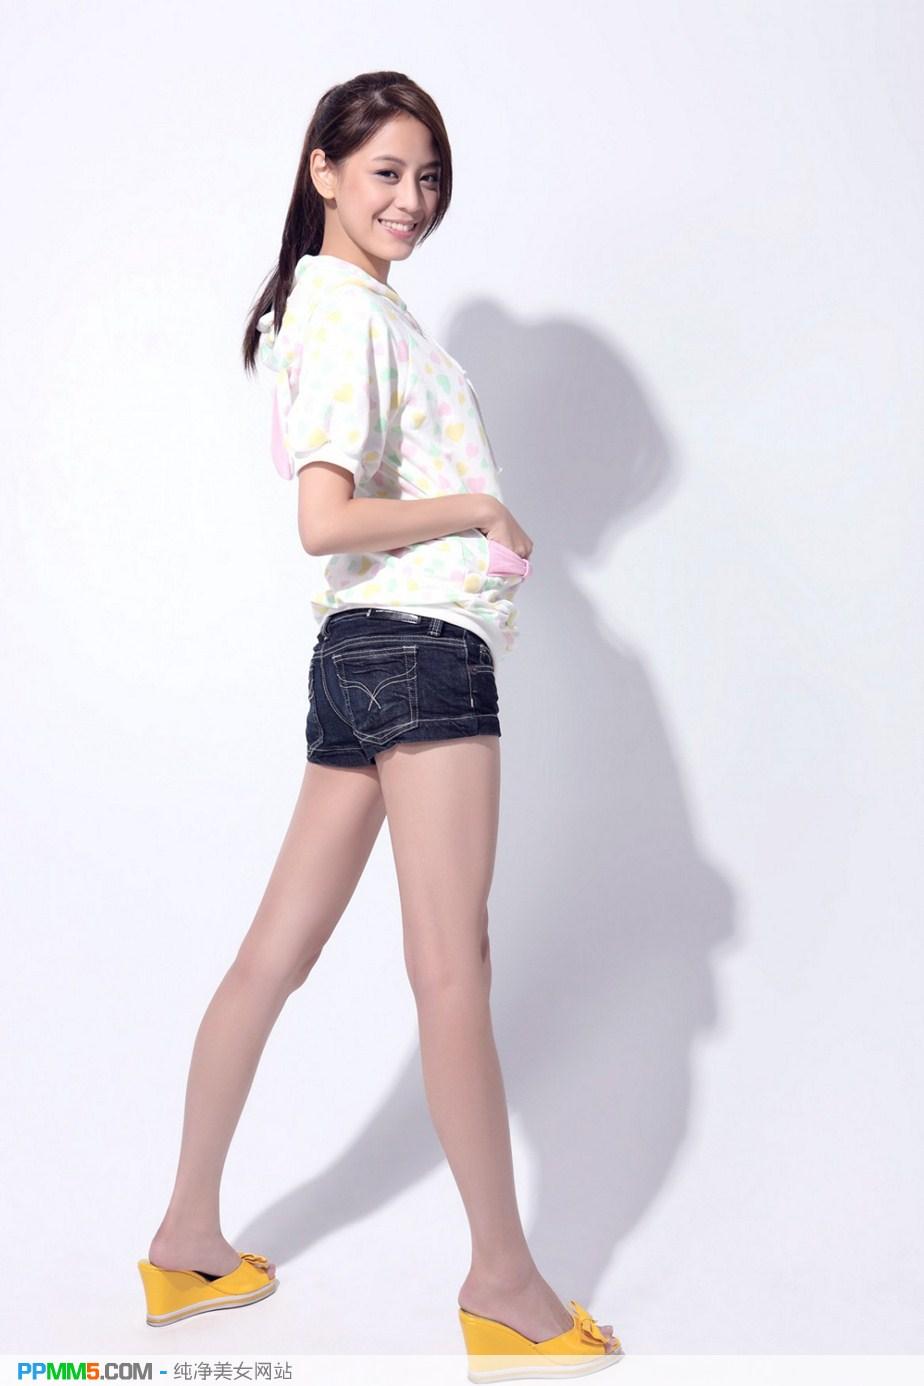 Taiwan Free Sex Video